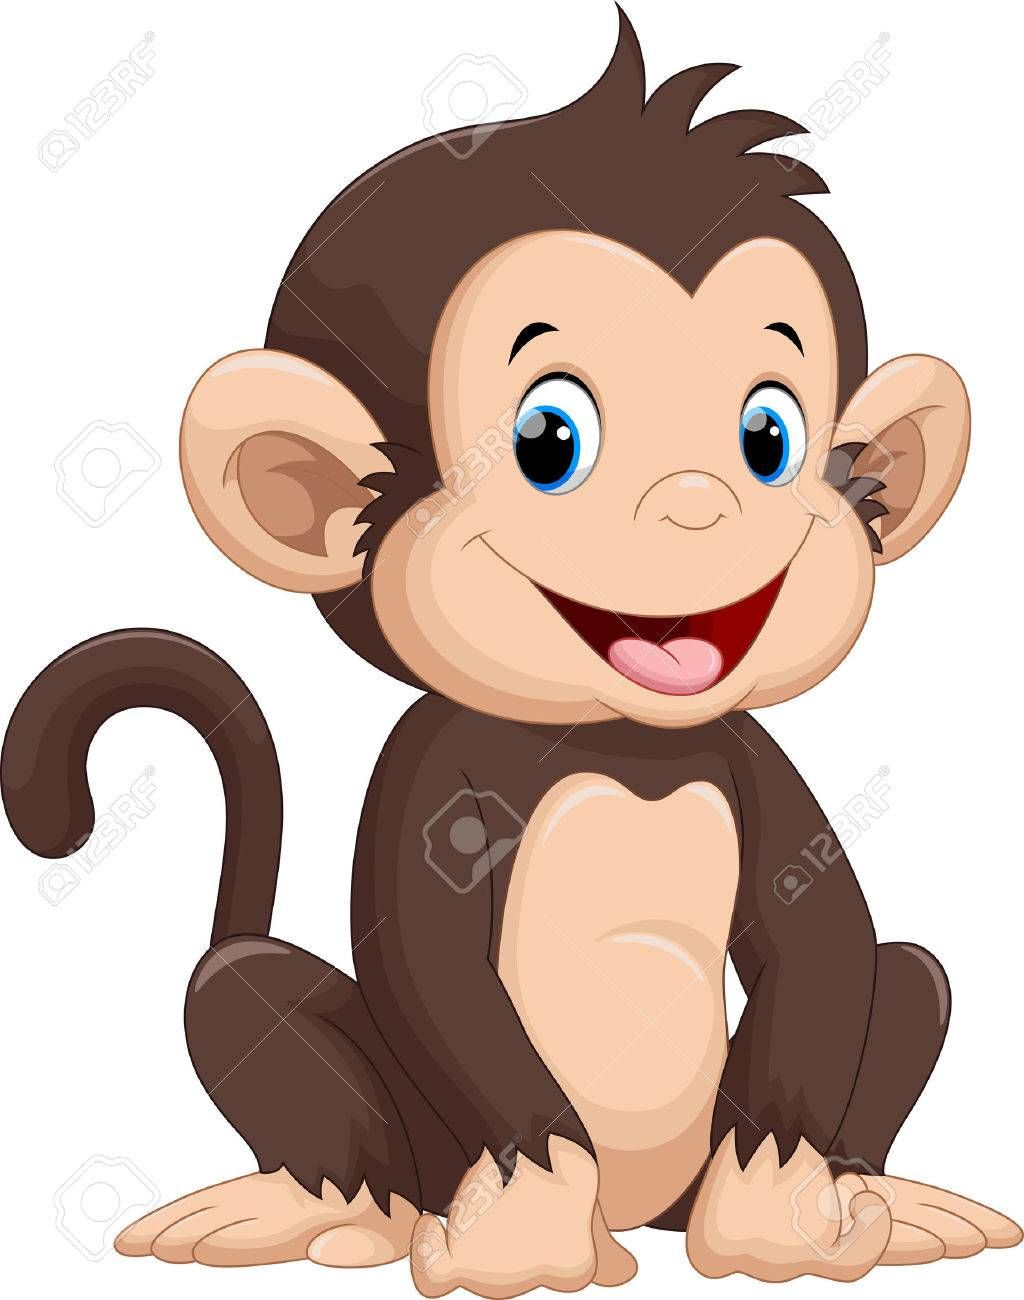 Cute Monkey Cartoon Monkey Illustration Cartoon Monkey Monkey Drawing